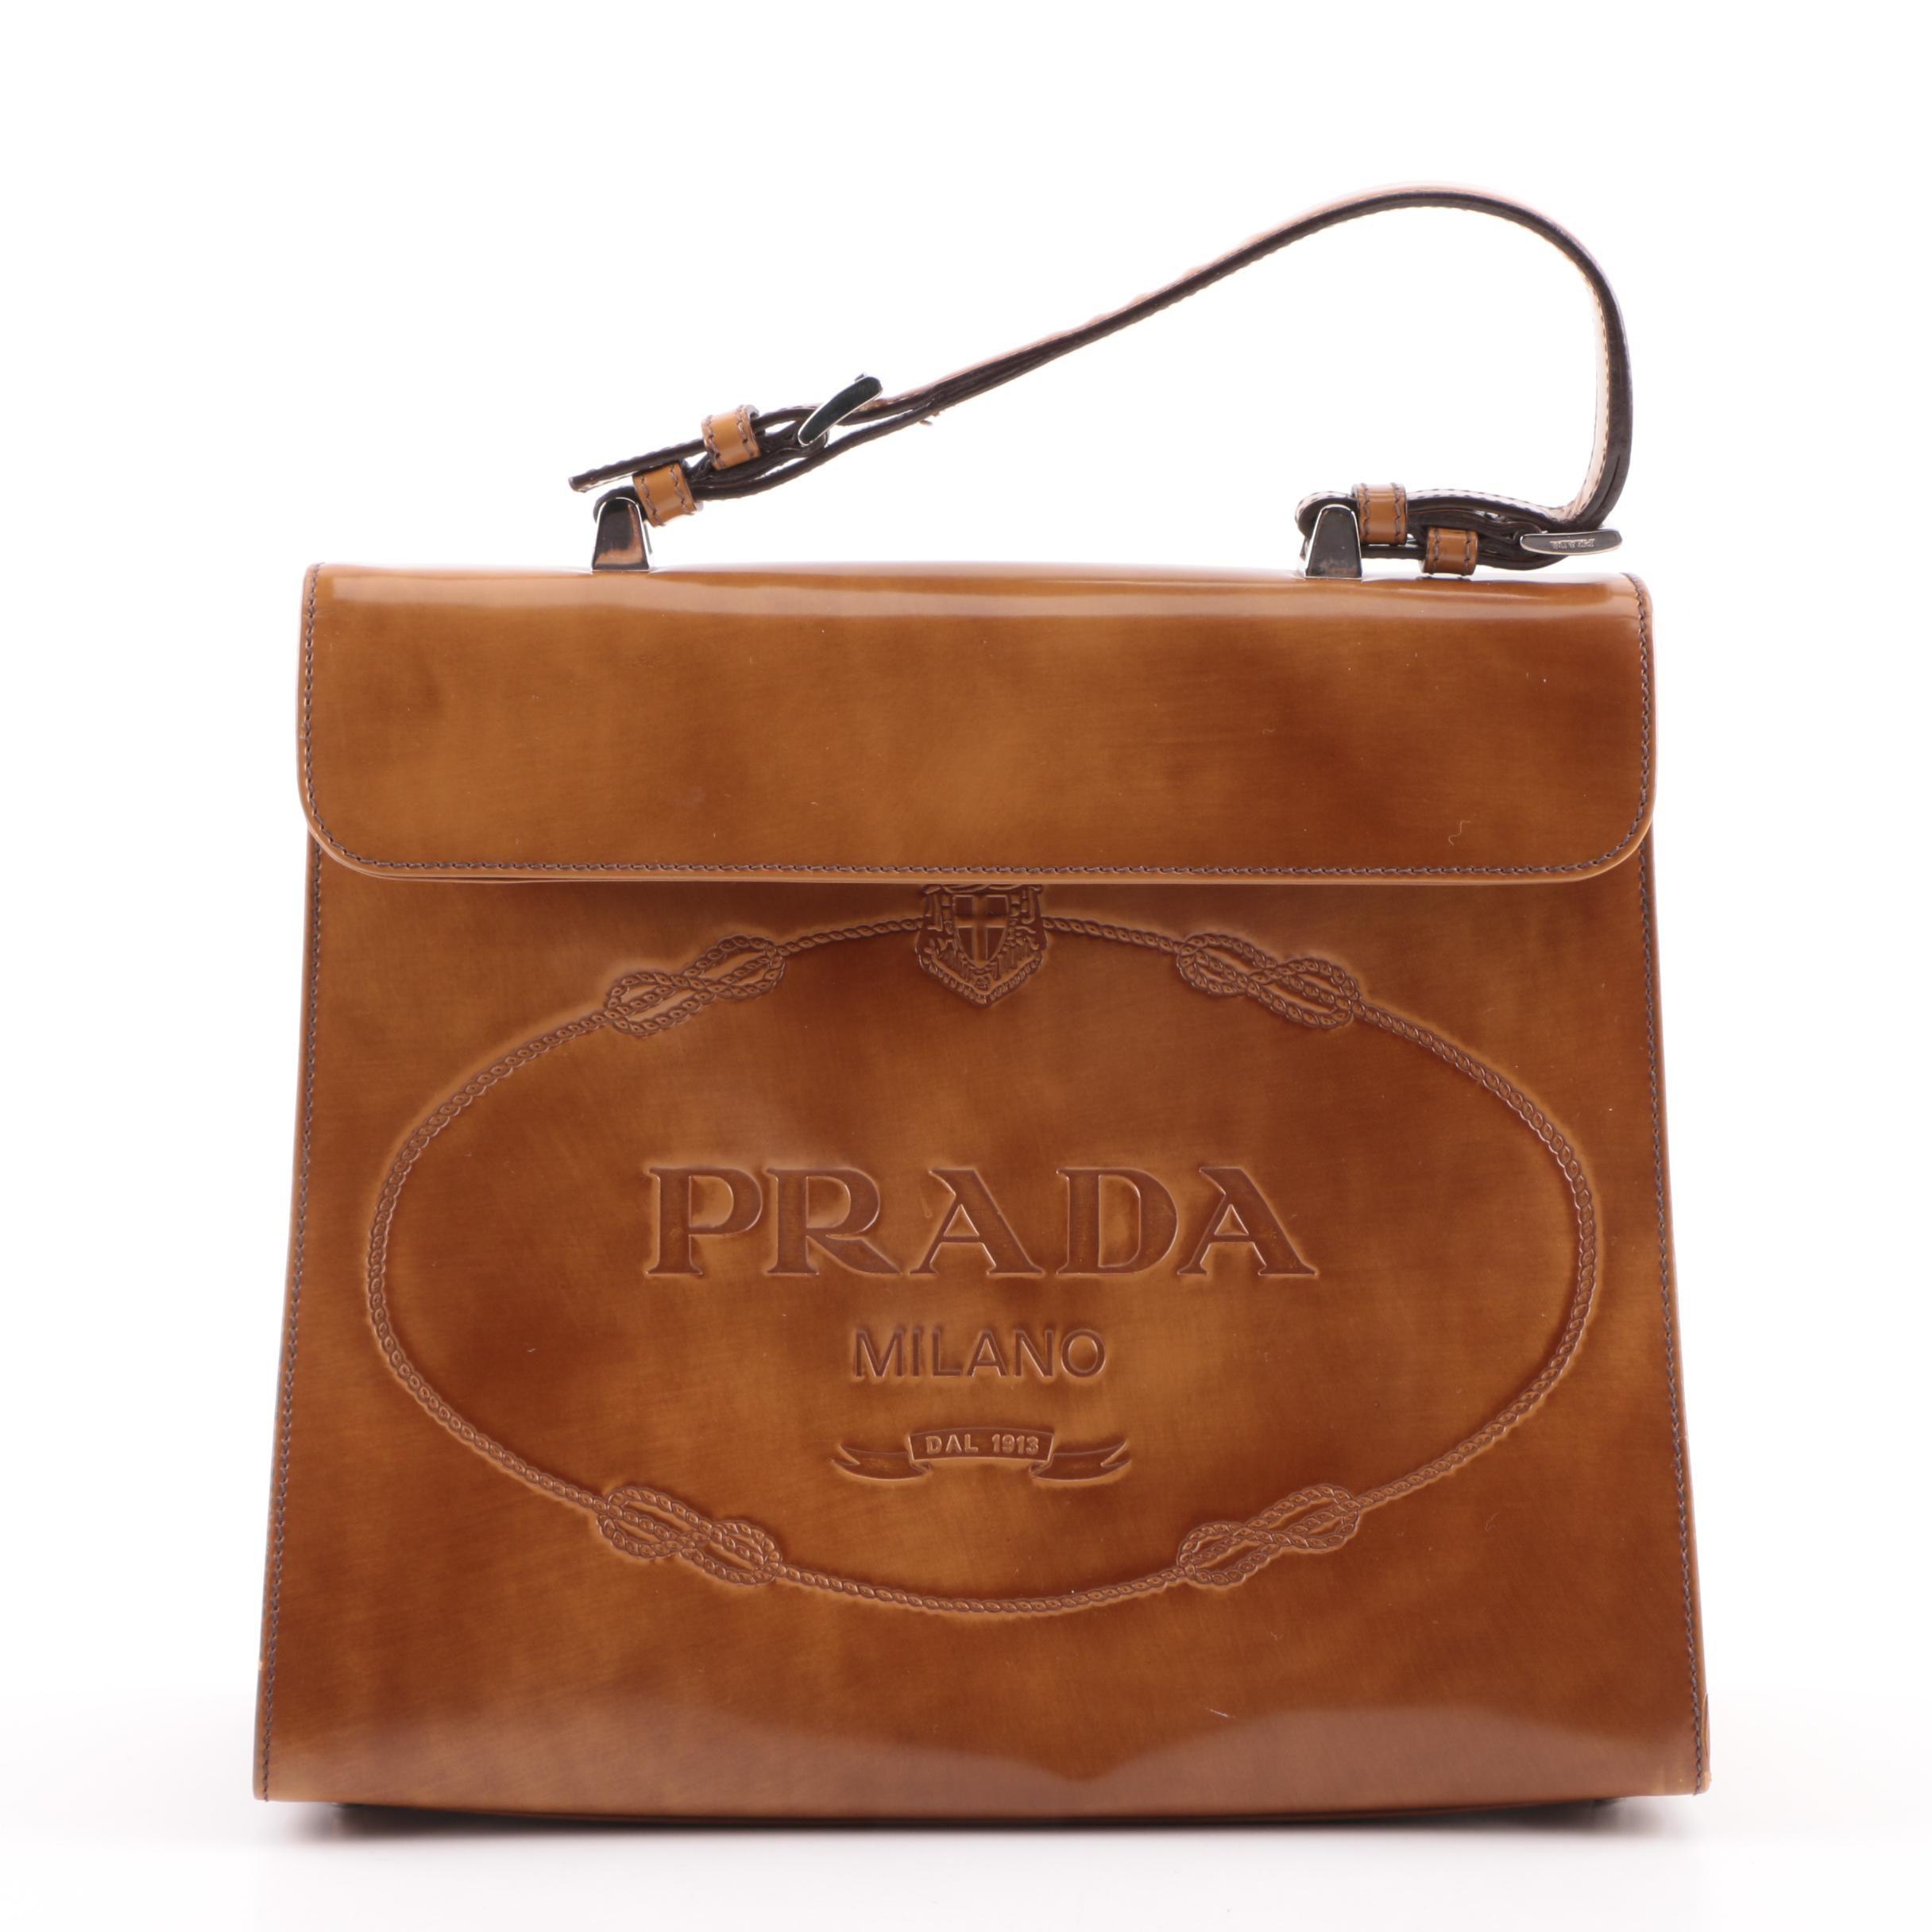 2005 Prada Ambra Spazzolato Leather Frame Bag